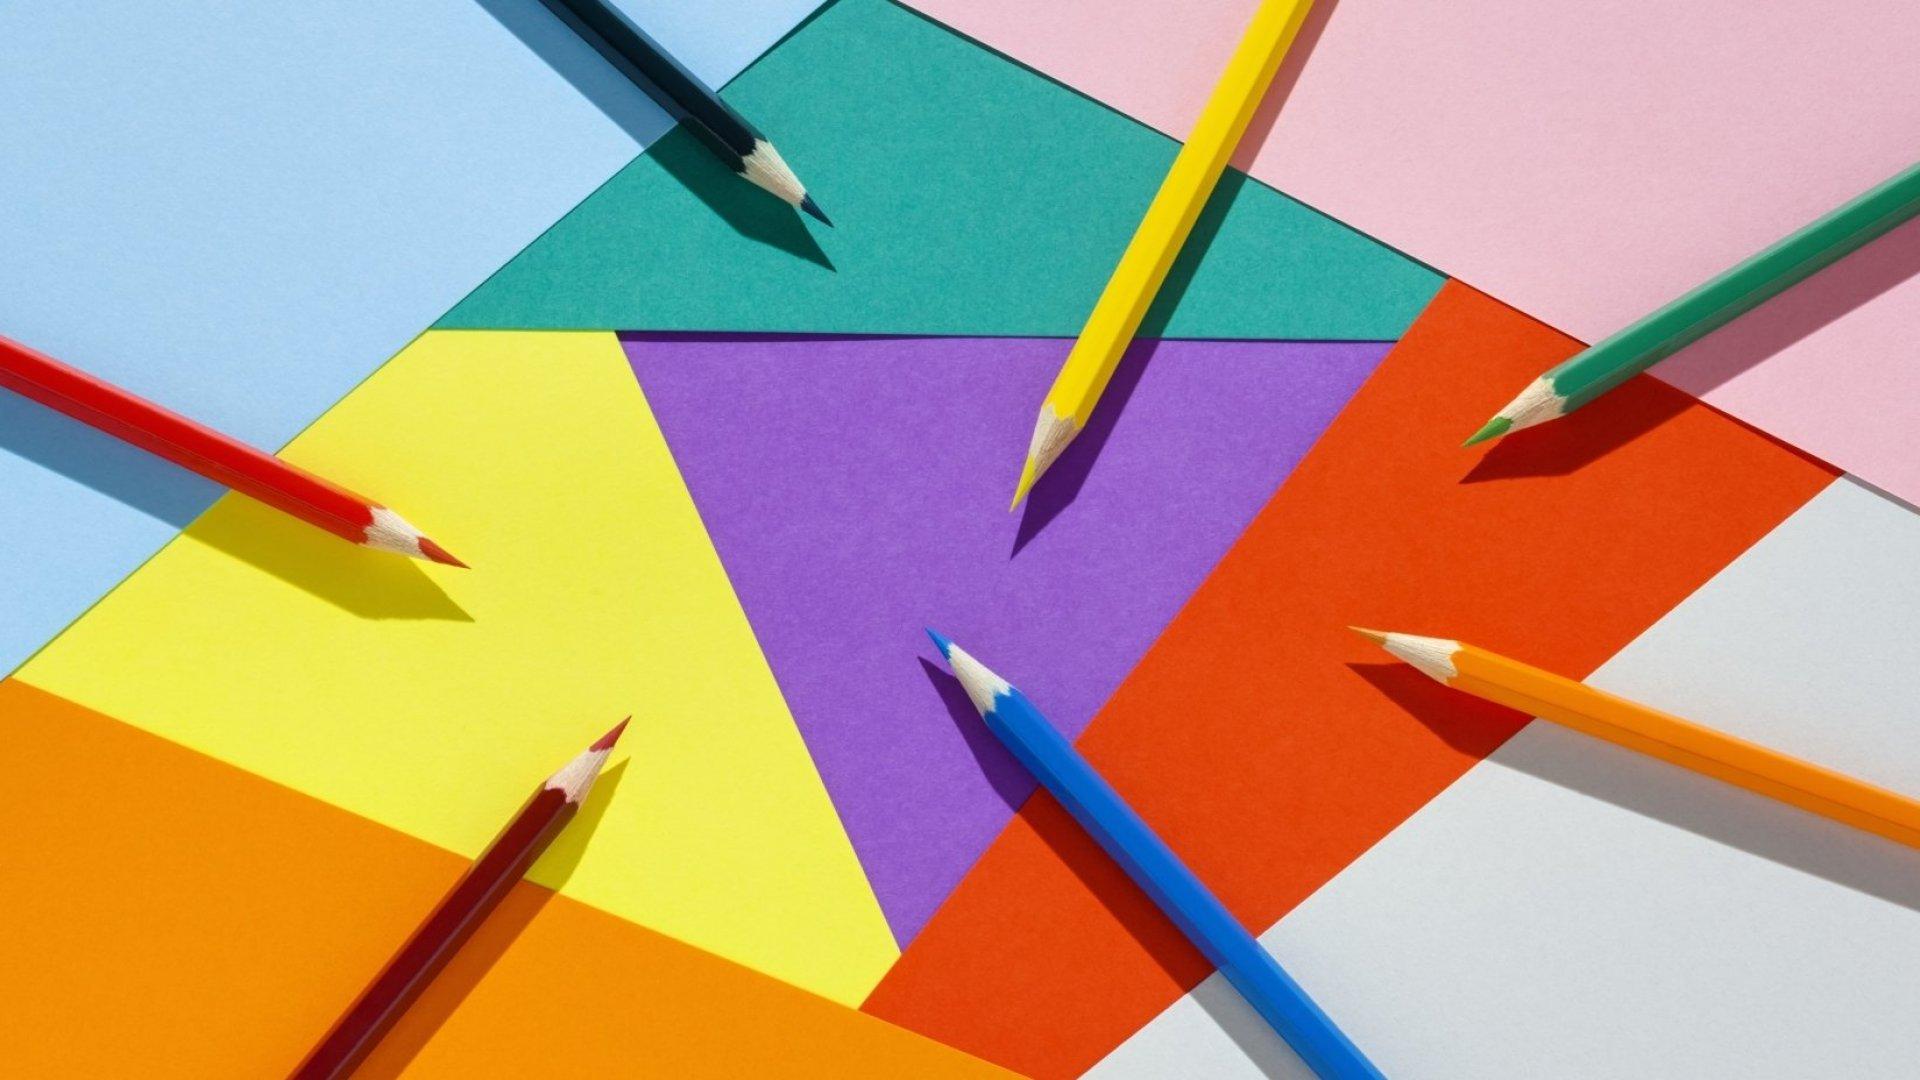 The Biggest Mistake Entrepreneurs Make When Hiring Designers